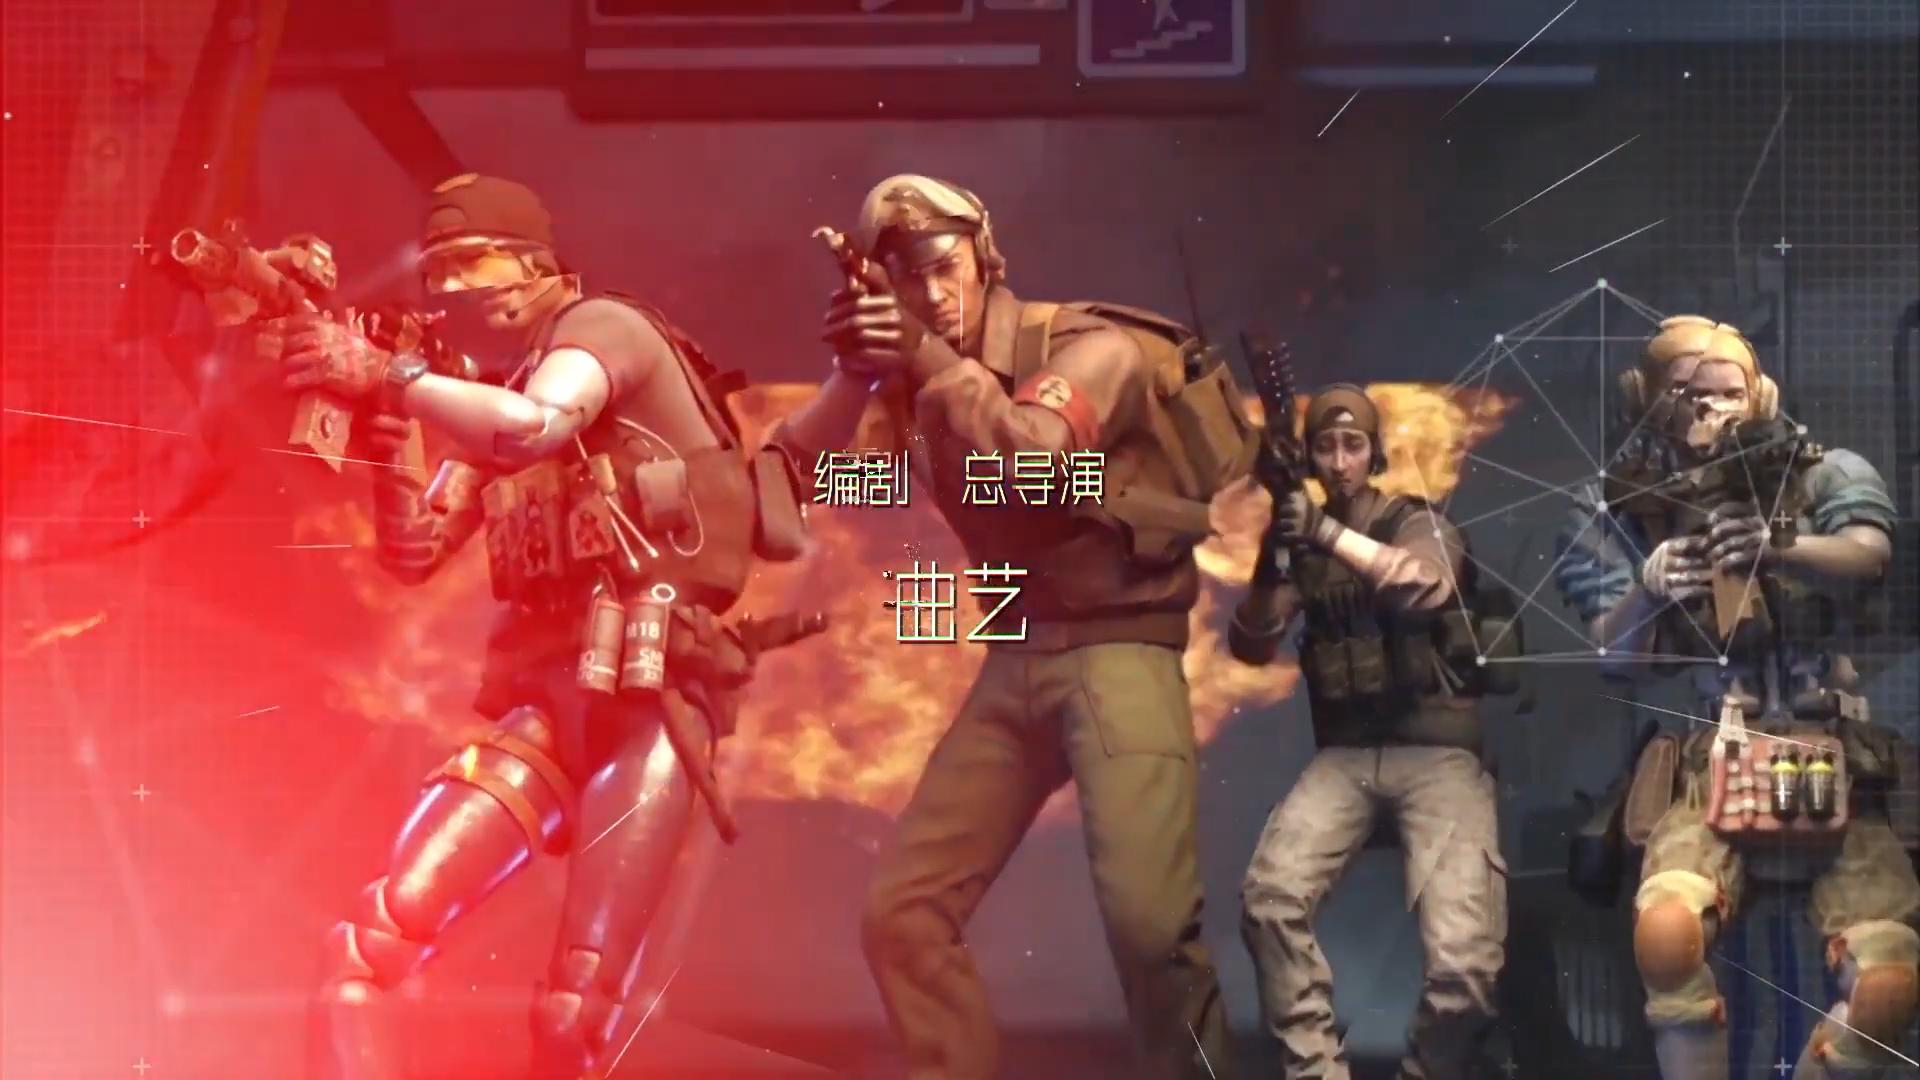 Moshi Juexing Zhi Ruqin - The Invasion of Awakening ( chinese anime donghua ) episode 01 english sub